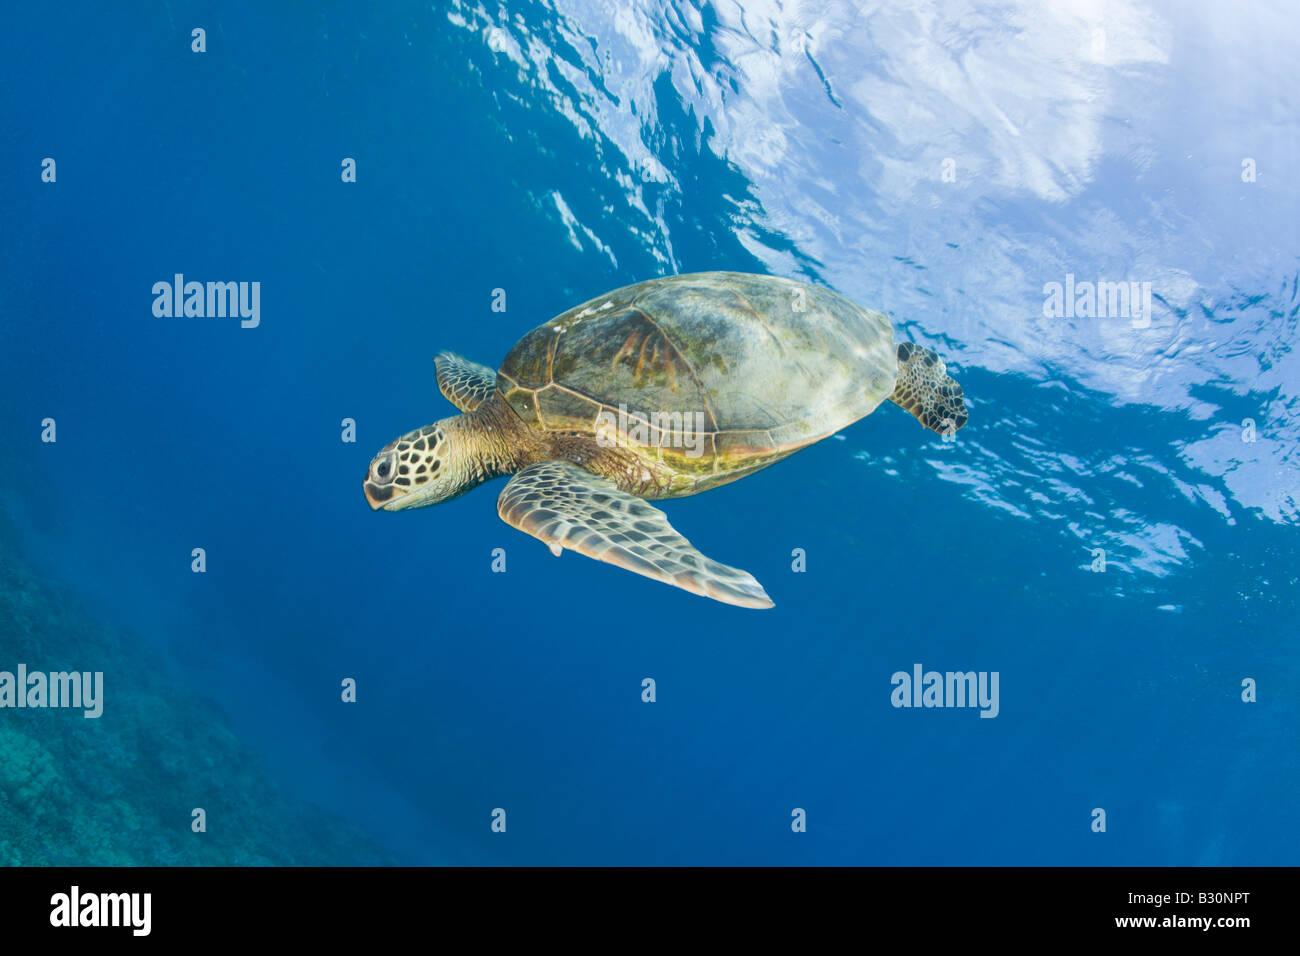 Tartaruga Verde Chelonia Mydas Isole Marshall Bikini Atoll Micronesia Oceano Pacifico Foto Stock